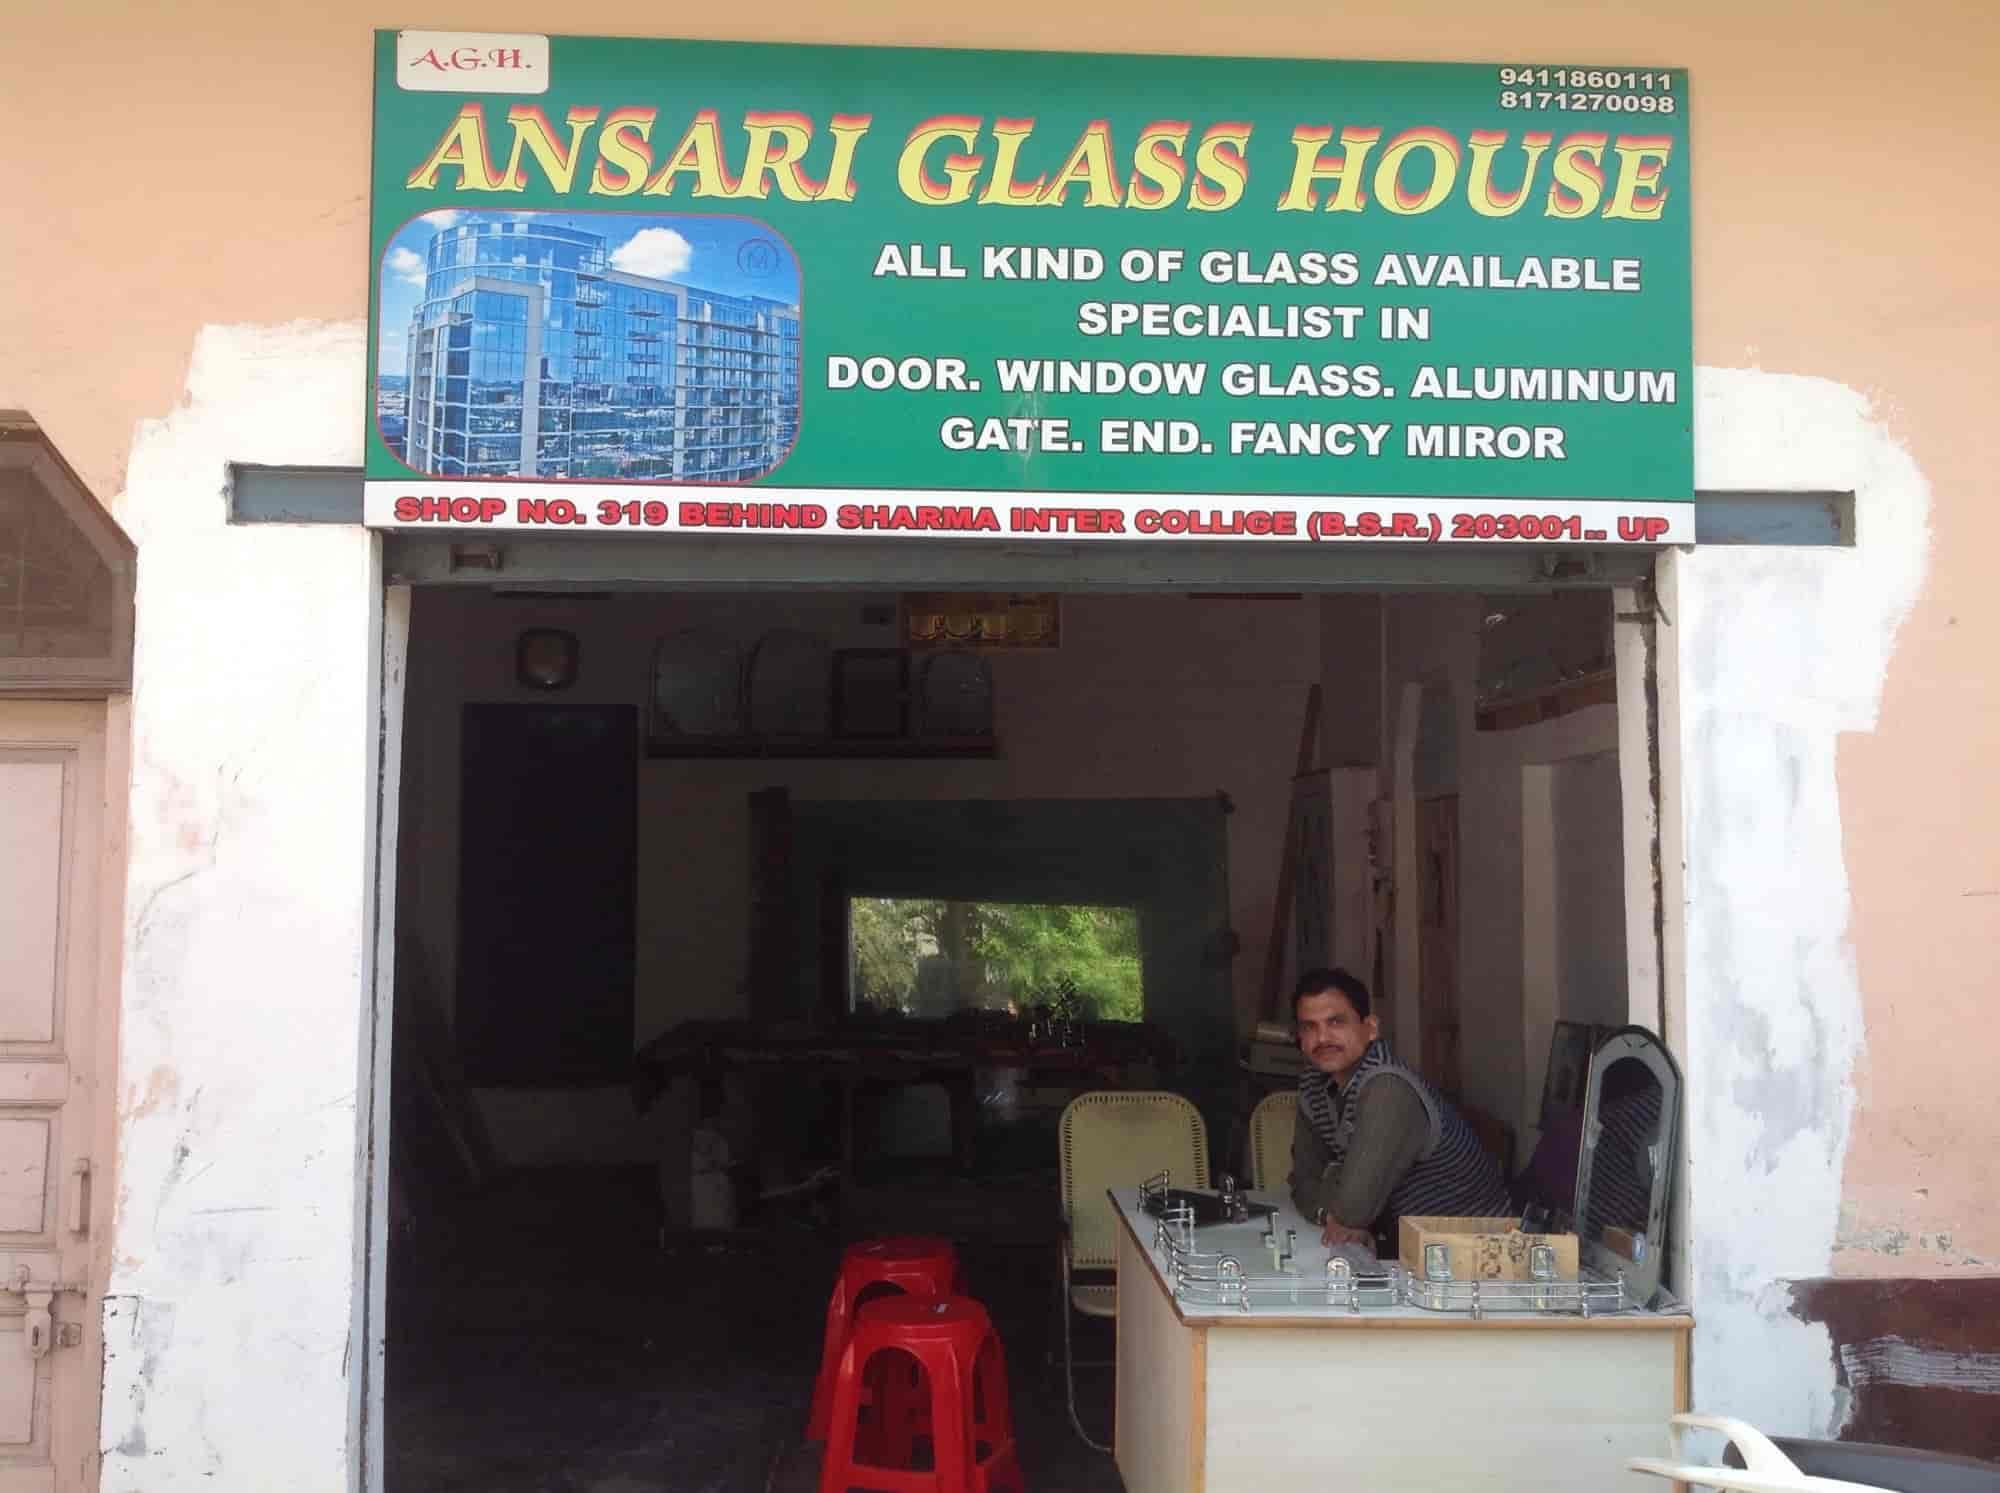 ansari glass house photos, , bulandshahr pictures \u0026 images galleryansari glass house photos, , bulandshahr pictures \u0026 images gallery justdial